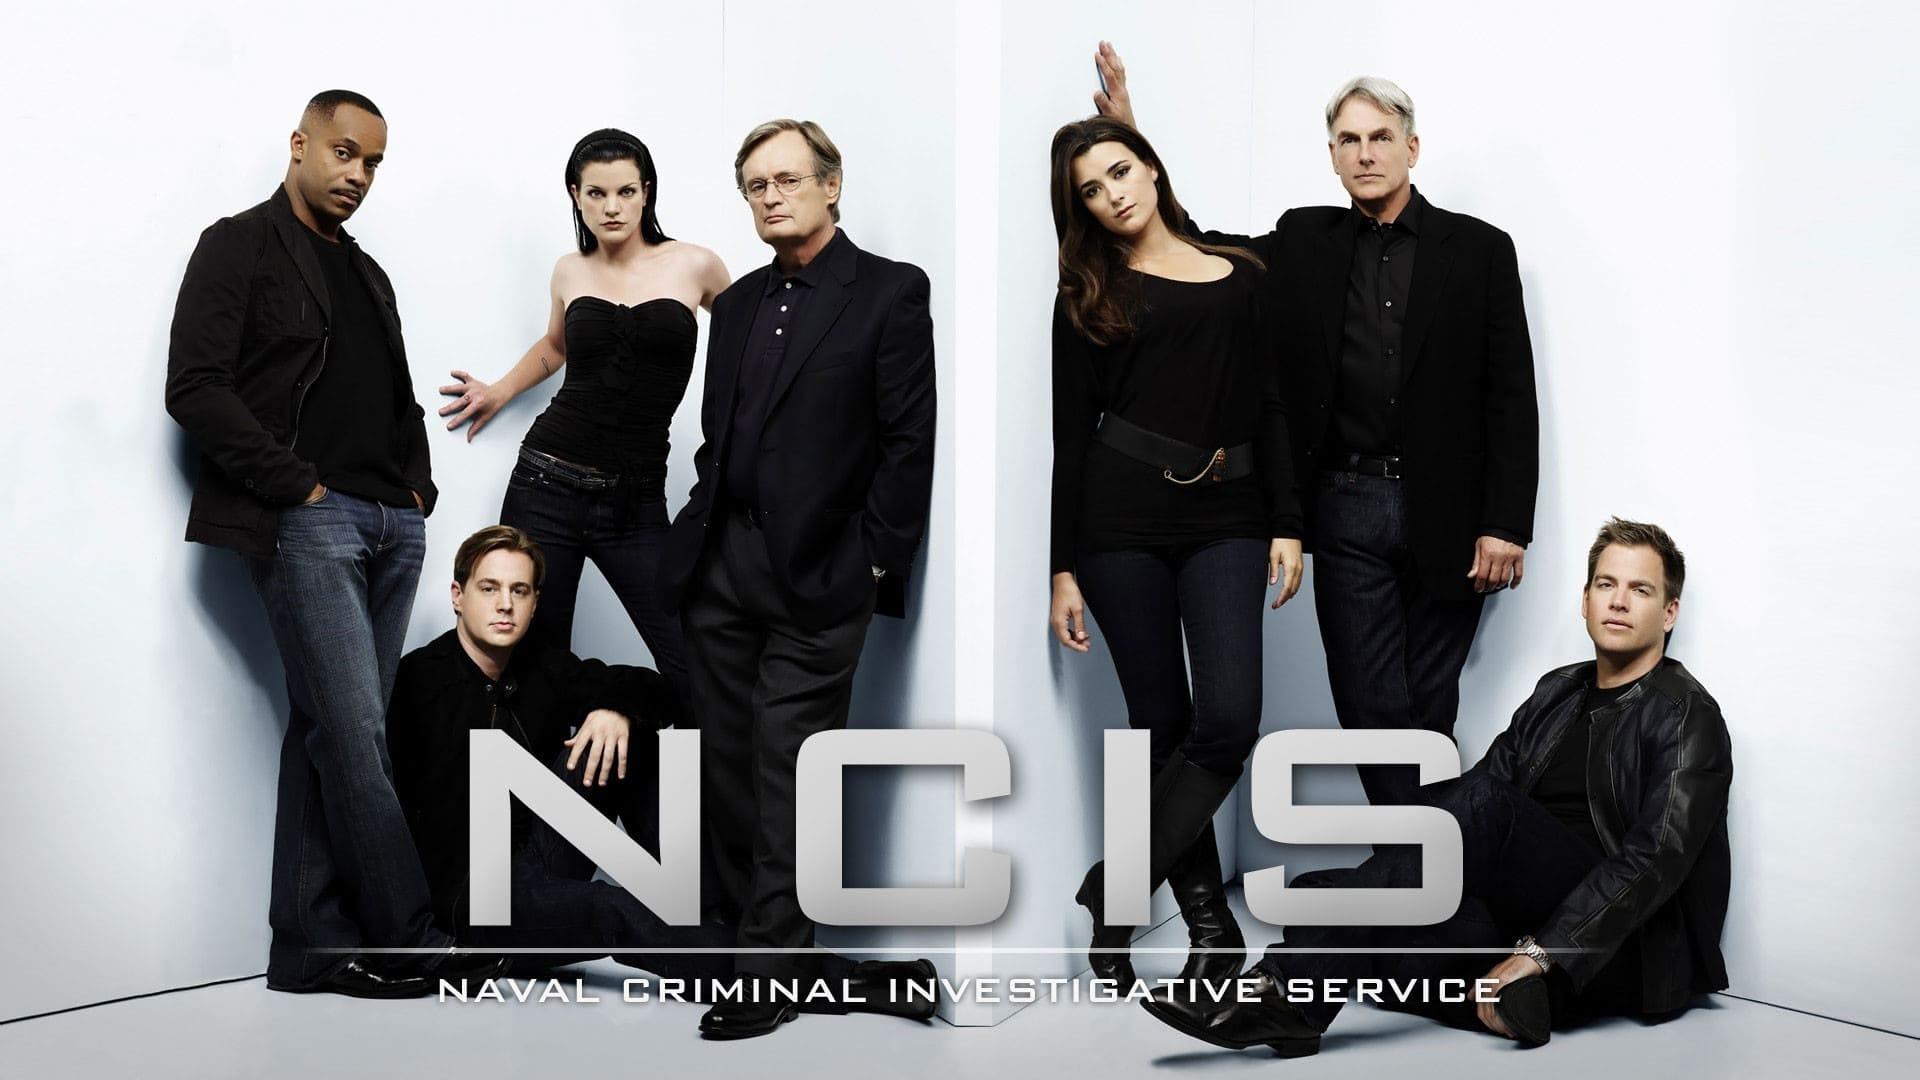 NCIS Season 4 Episode 3 : Singled Out